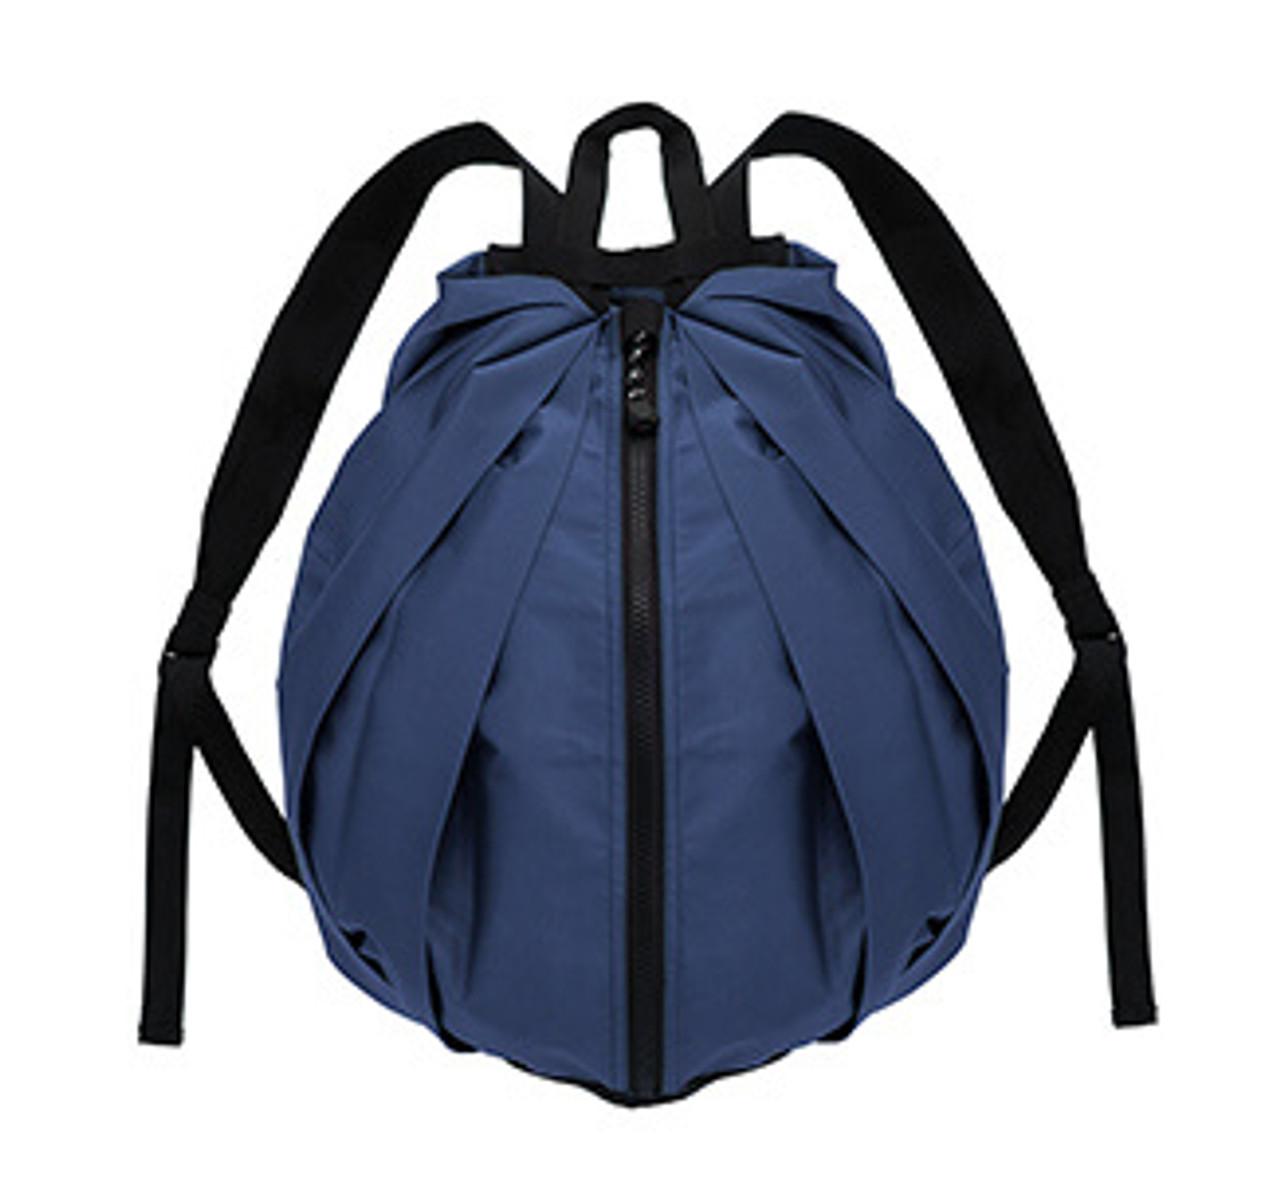 Marna Shupatto Rucksack Navy Складной рюкзак